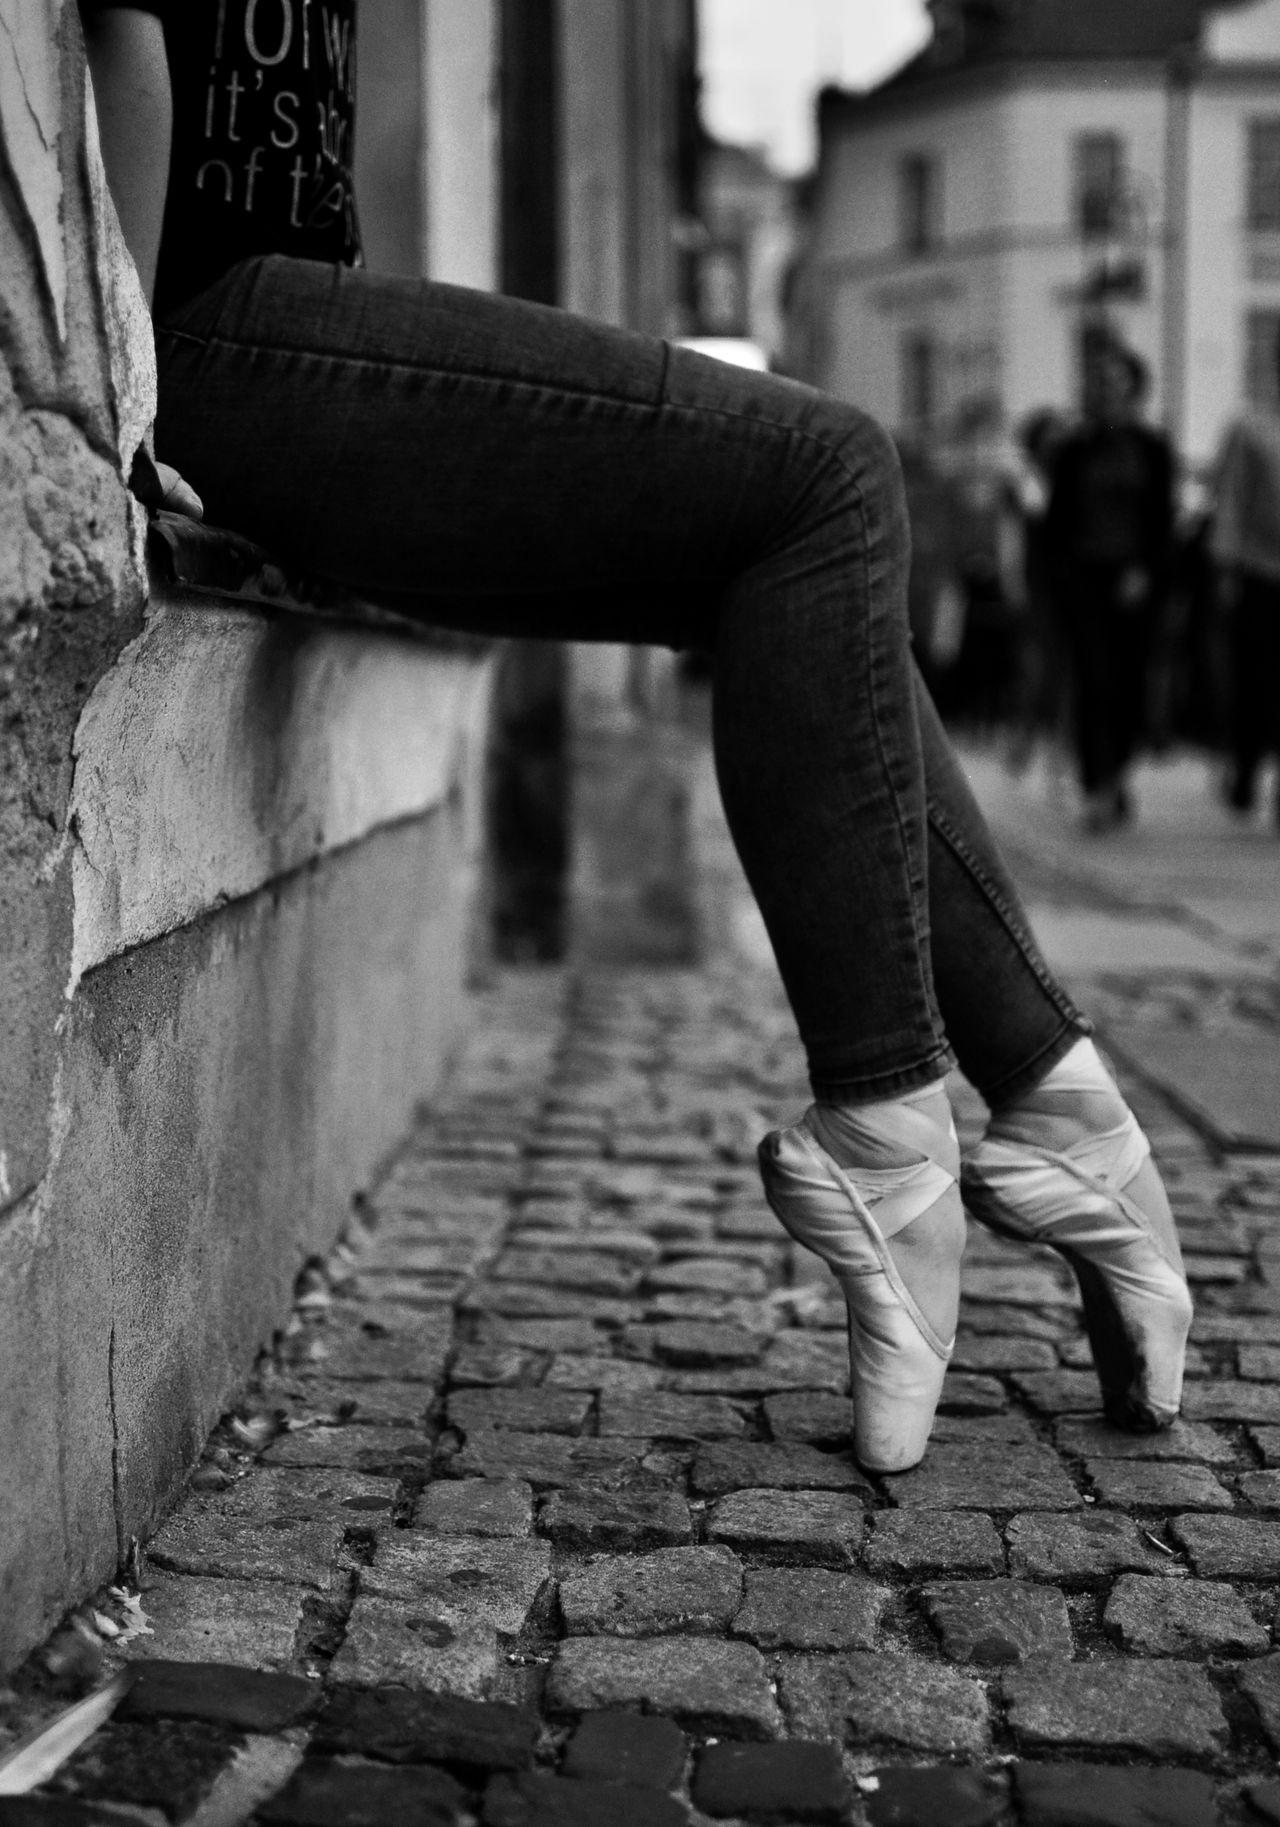 Ballet Blackandwhite City Dance Dancer Girl Legs Monochrome Photography Old Town Person Pointe Shoes Shoe